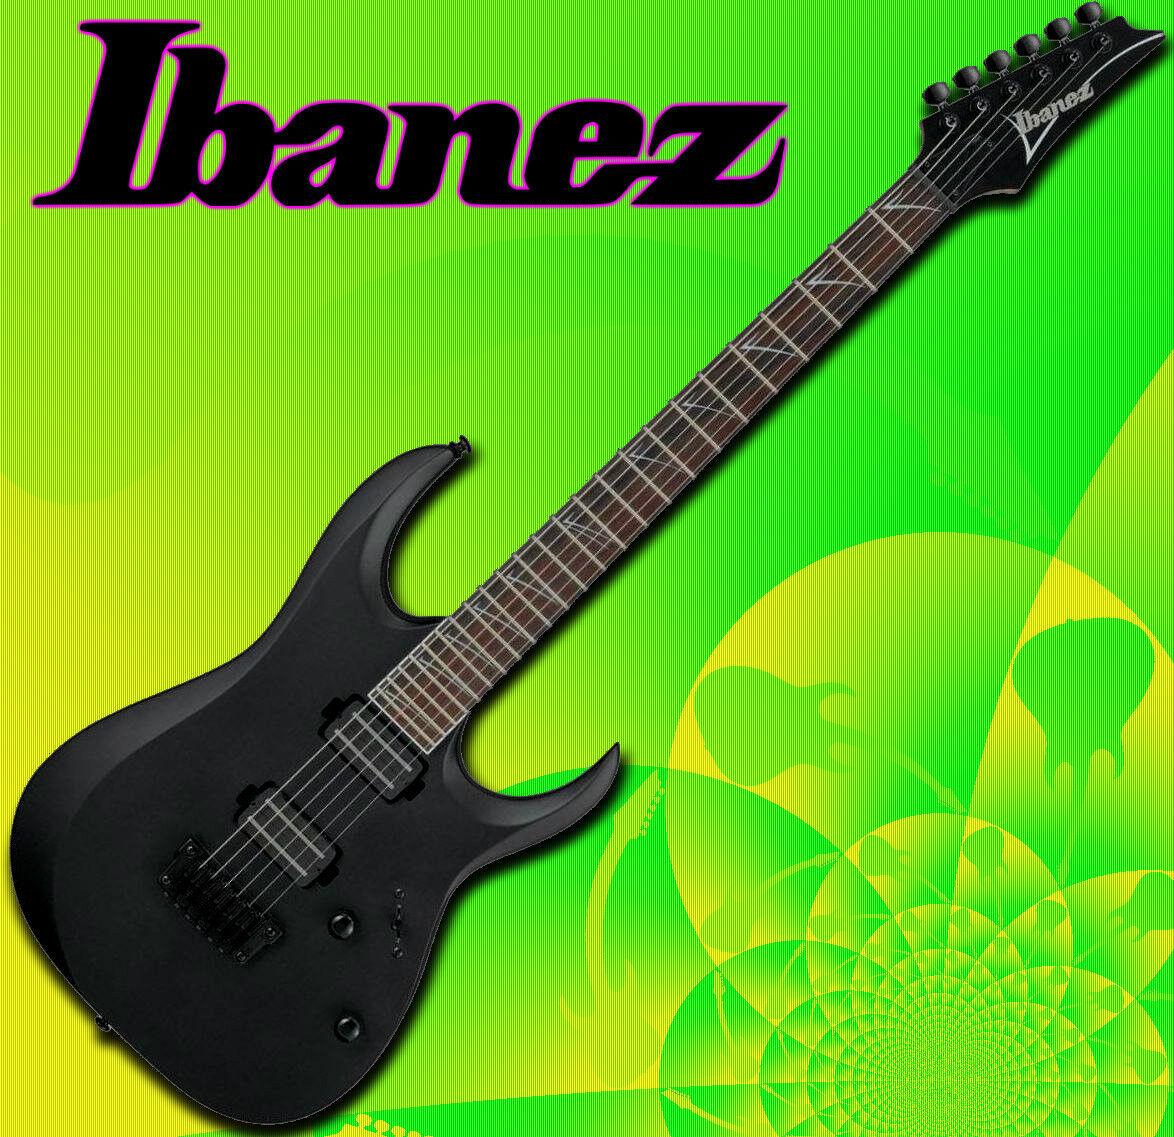 IBANEZ RGD 321 drop 6 string corde RGD321 down-tuning RG series 7 baritone metal